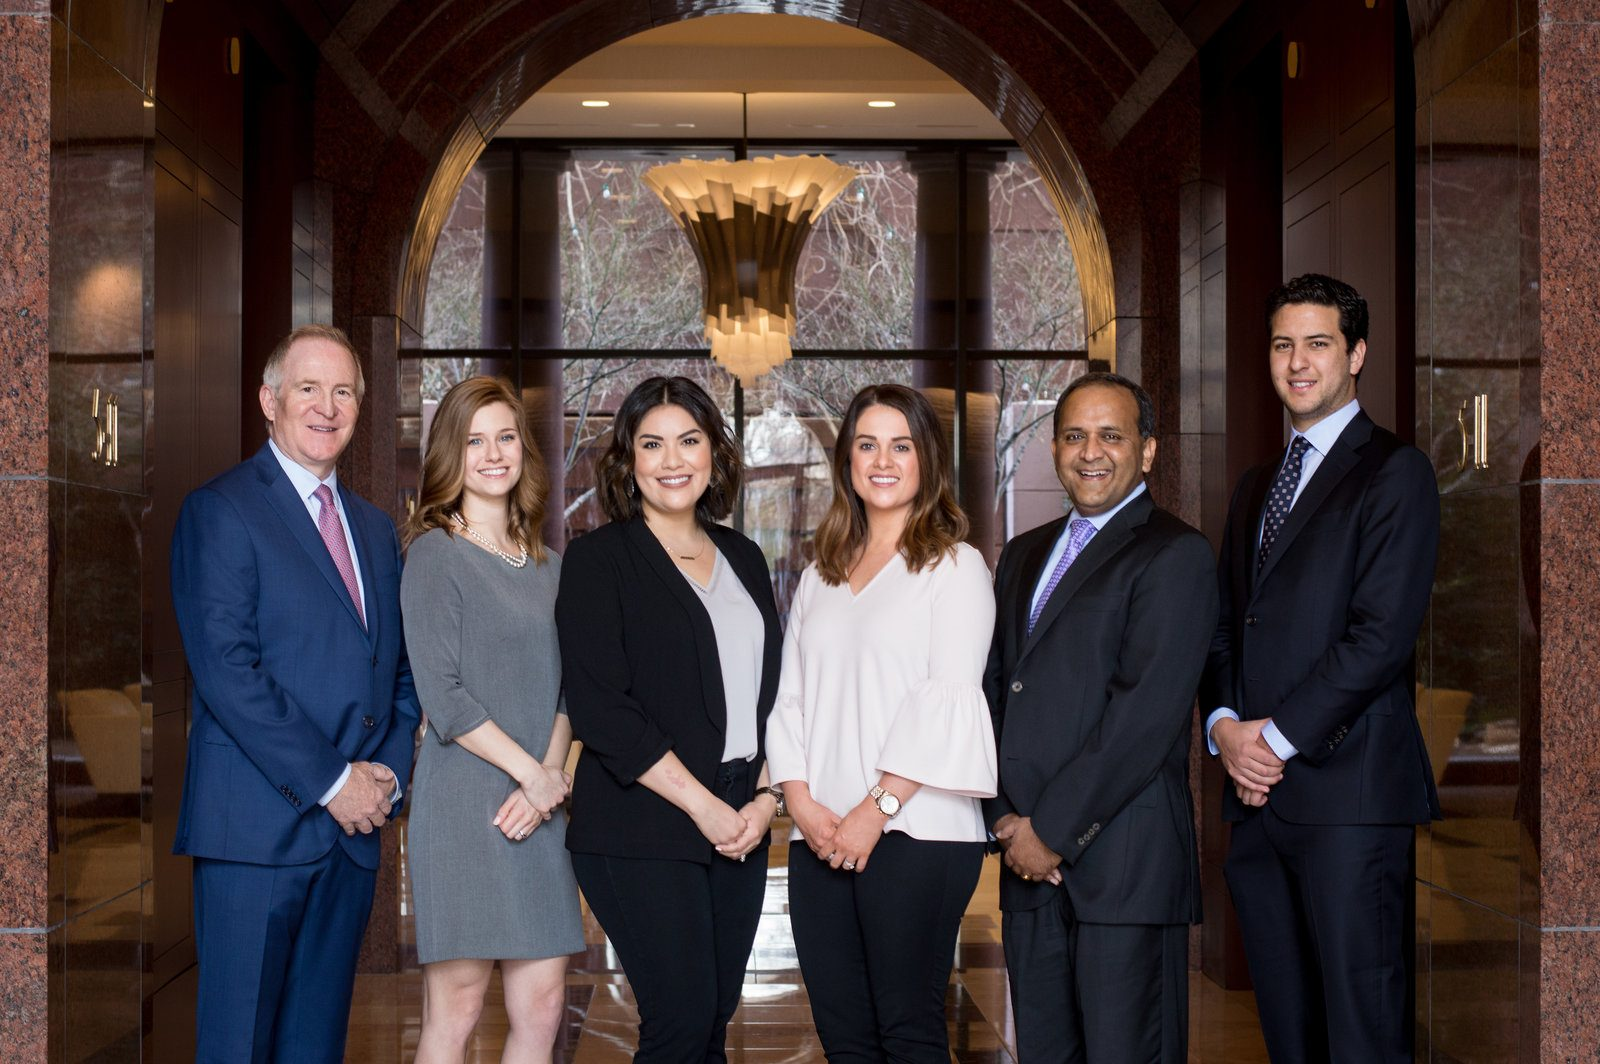 The Jlc Group Dallas Tx Morgan Stanley Wealth Management